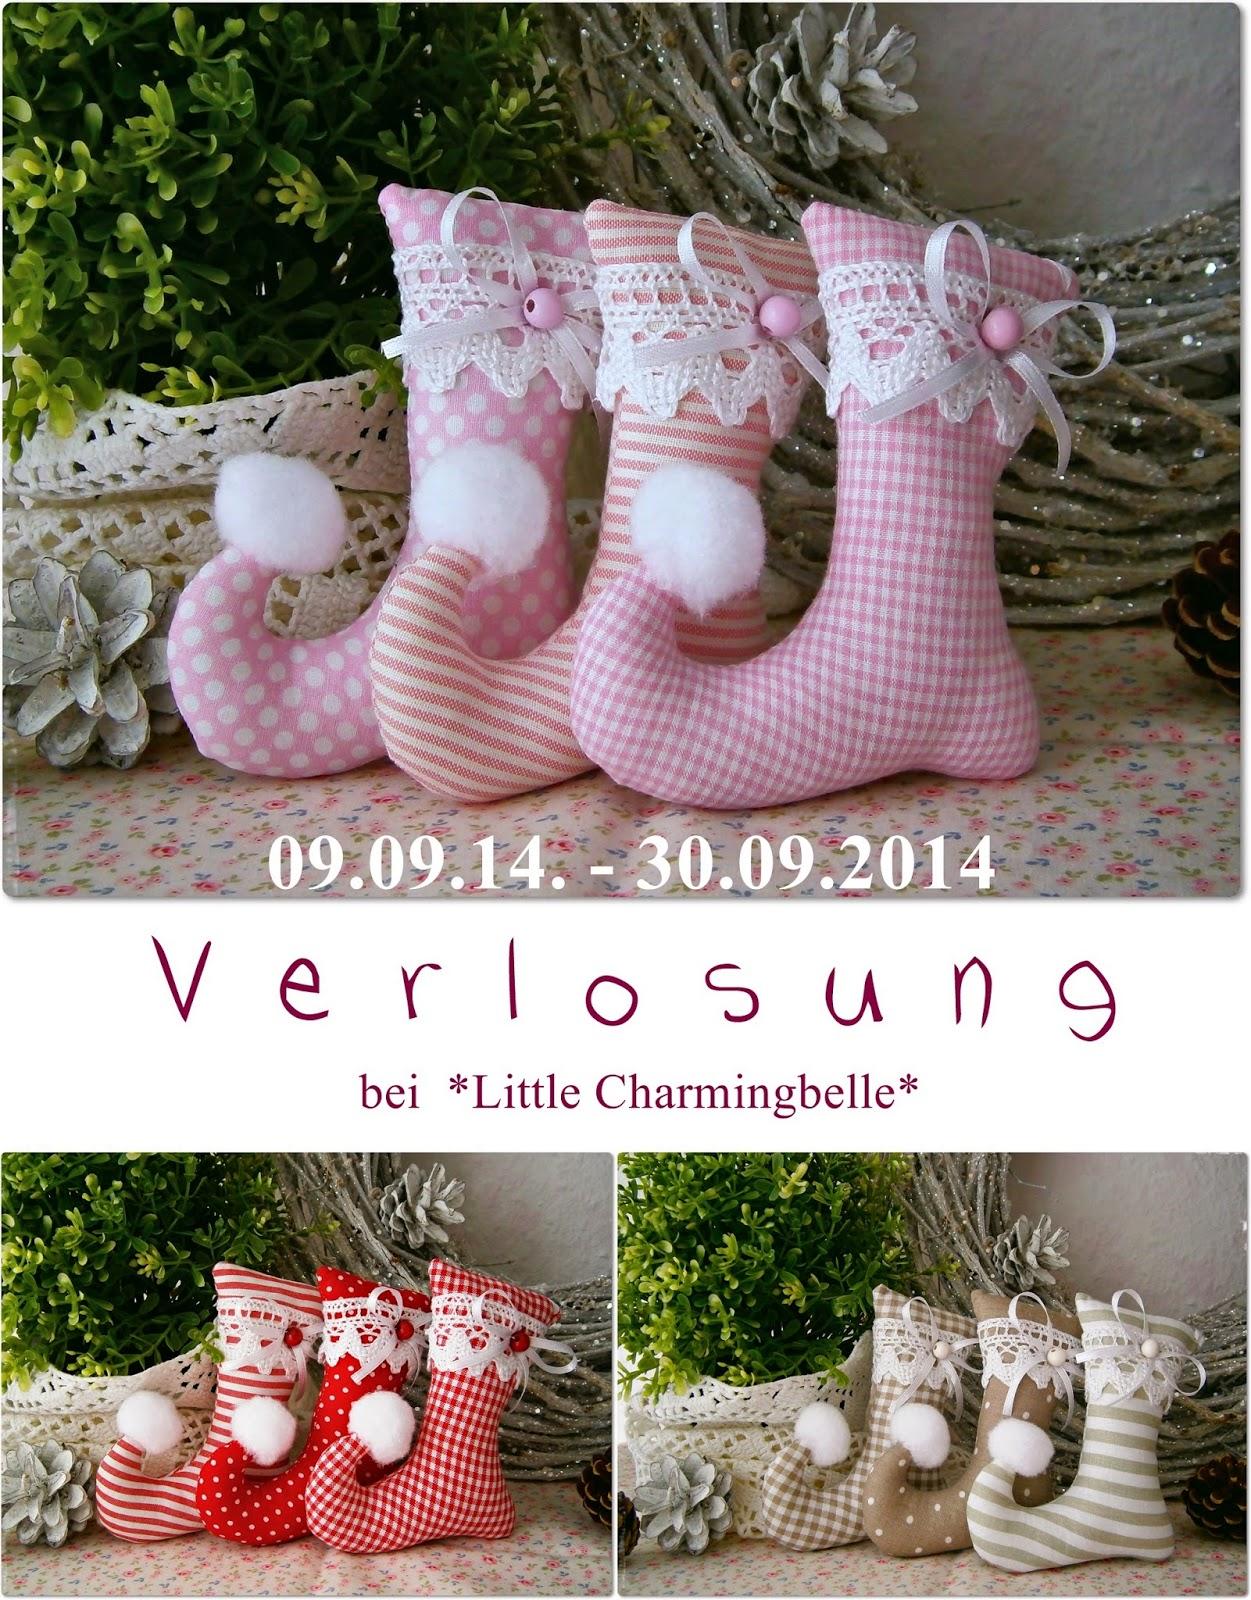 Verlosung bei Little Charmingbelle